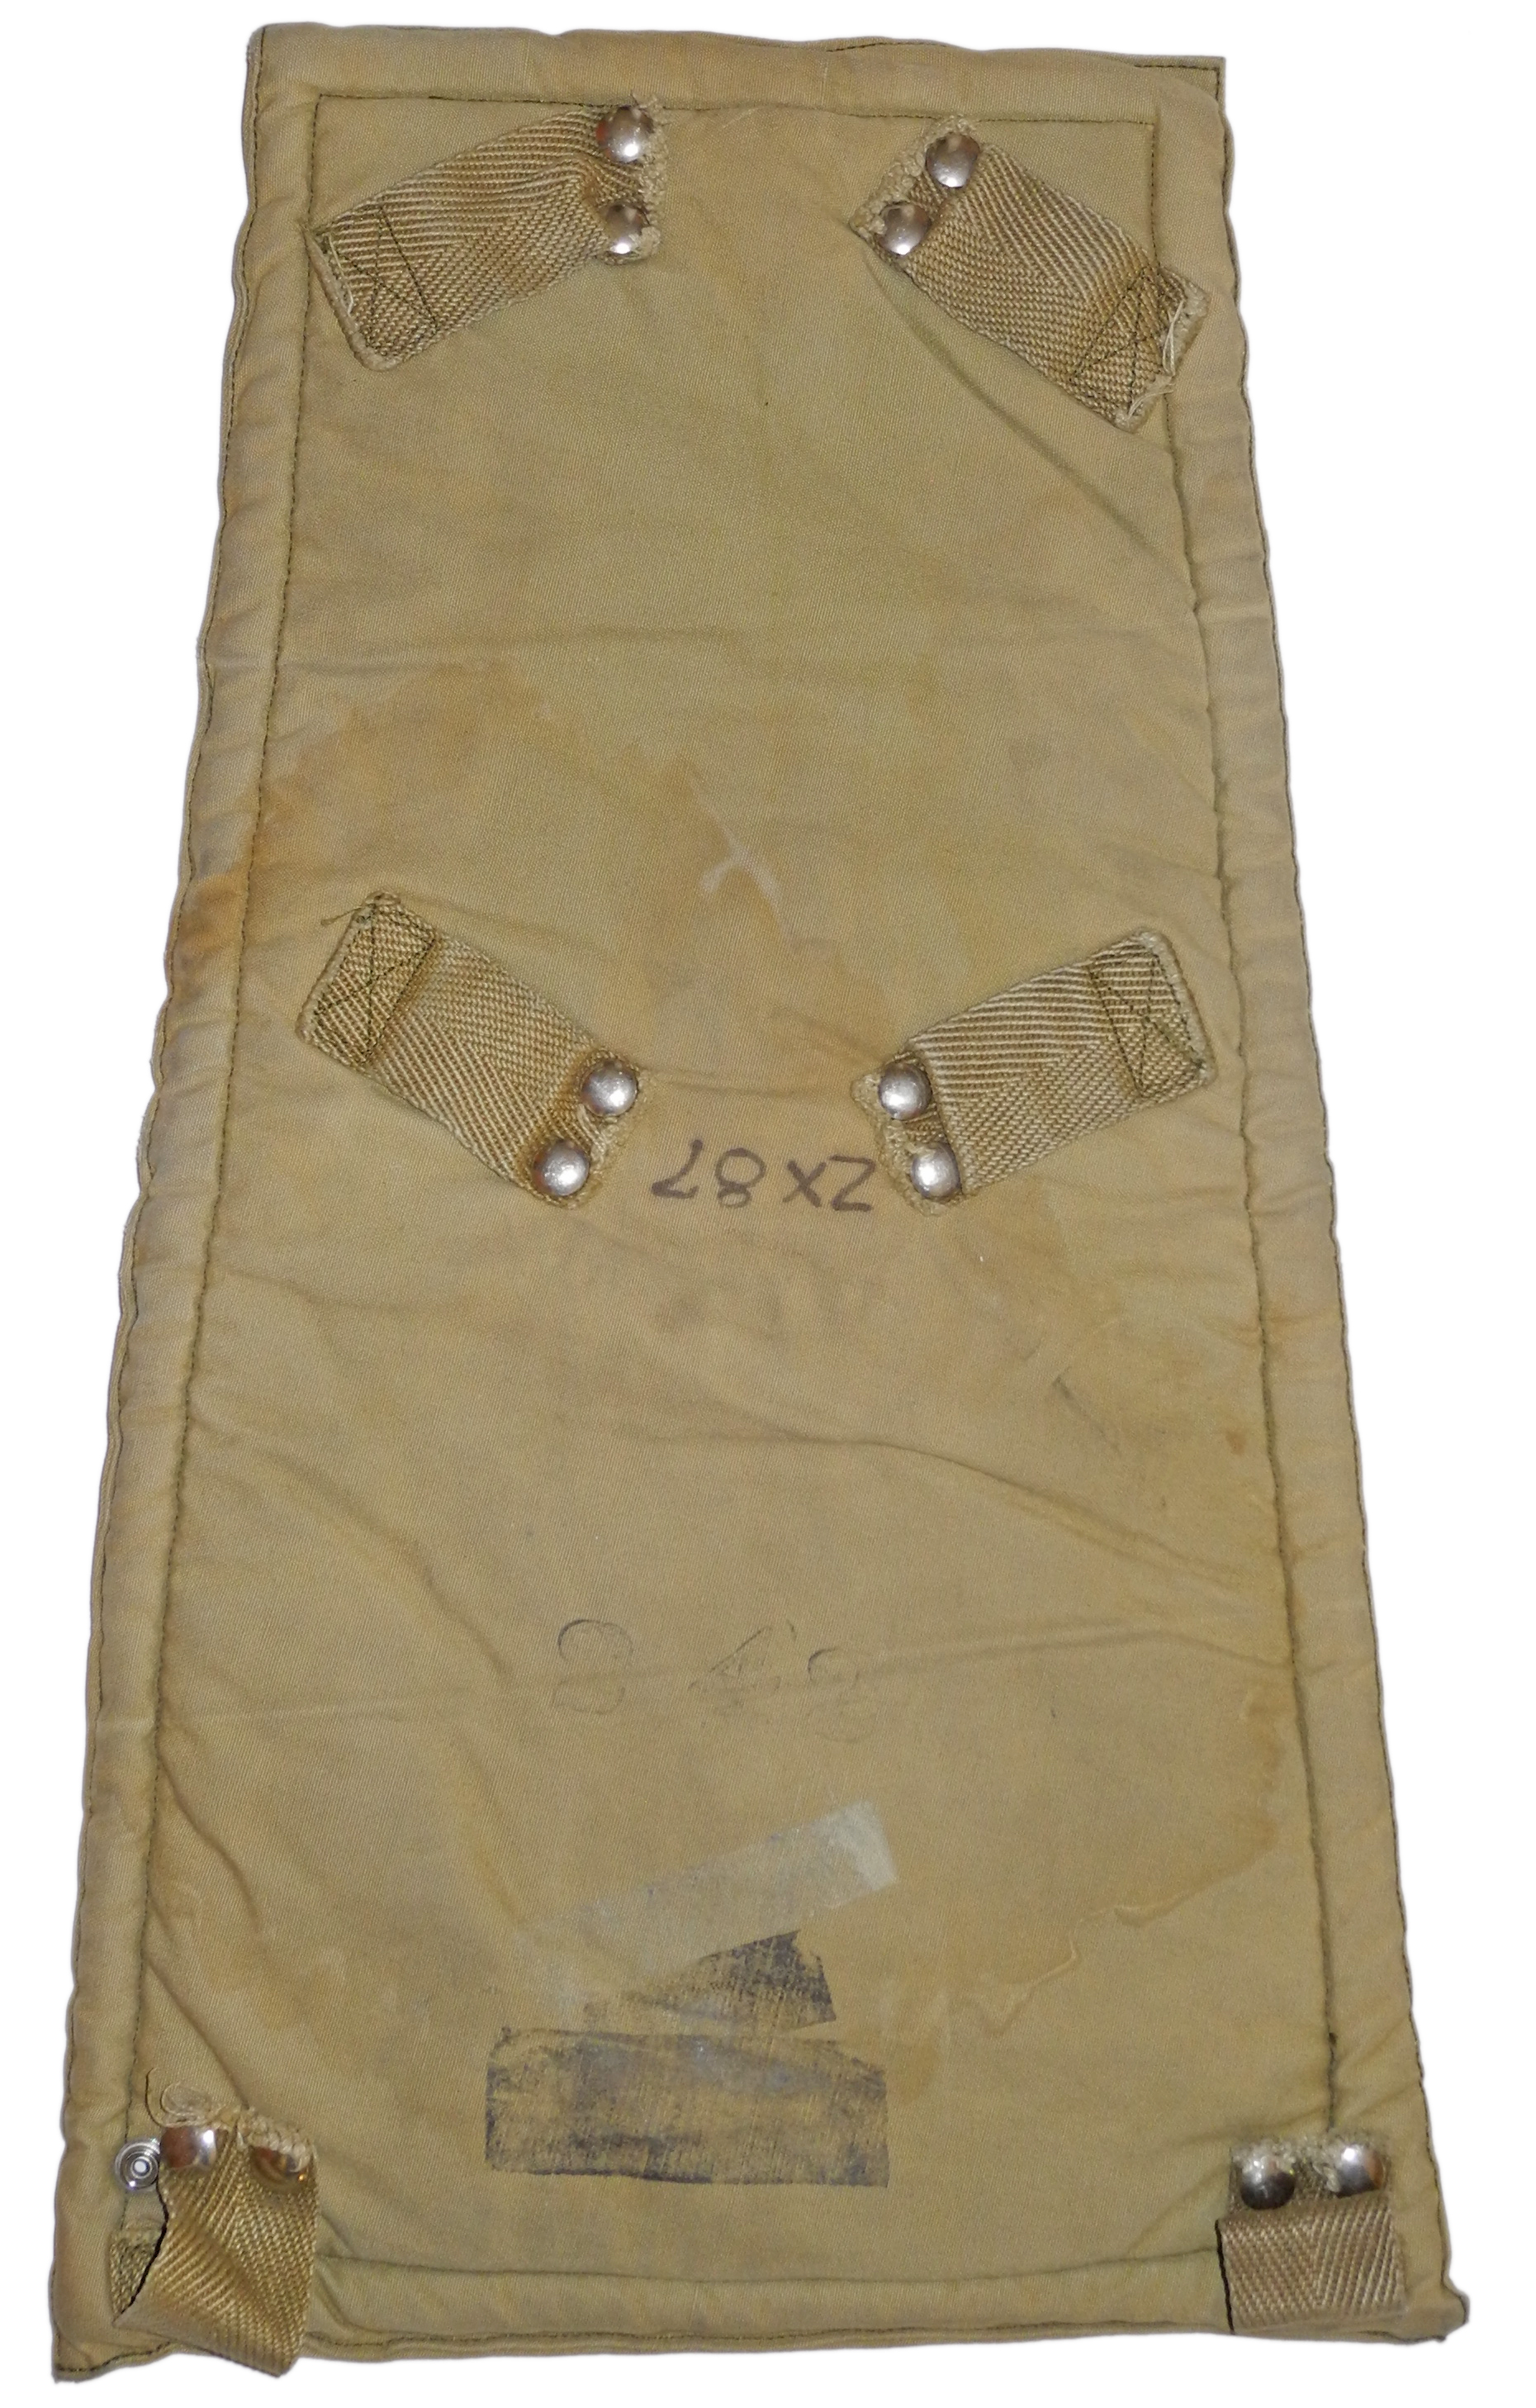 RAF/RCAF parachute back cushion